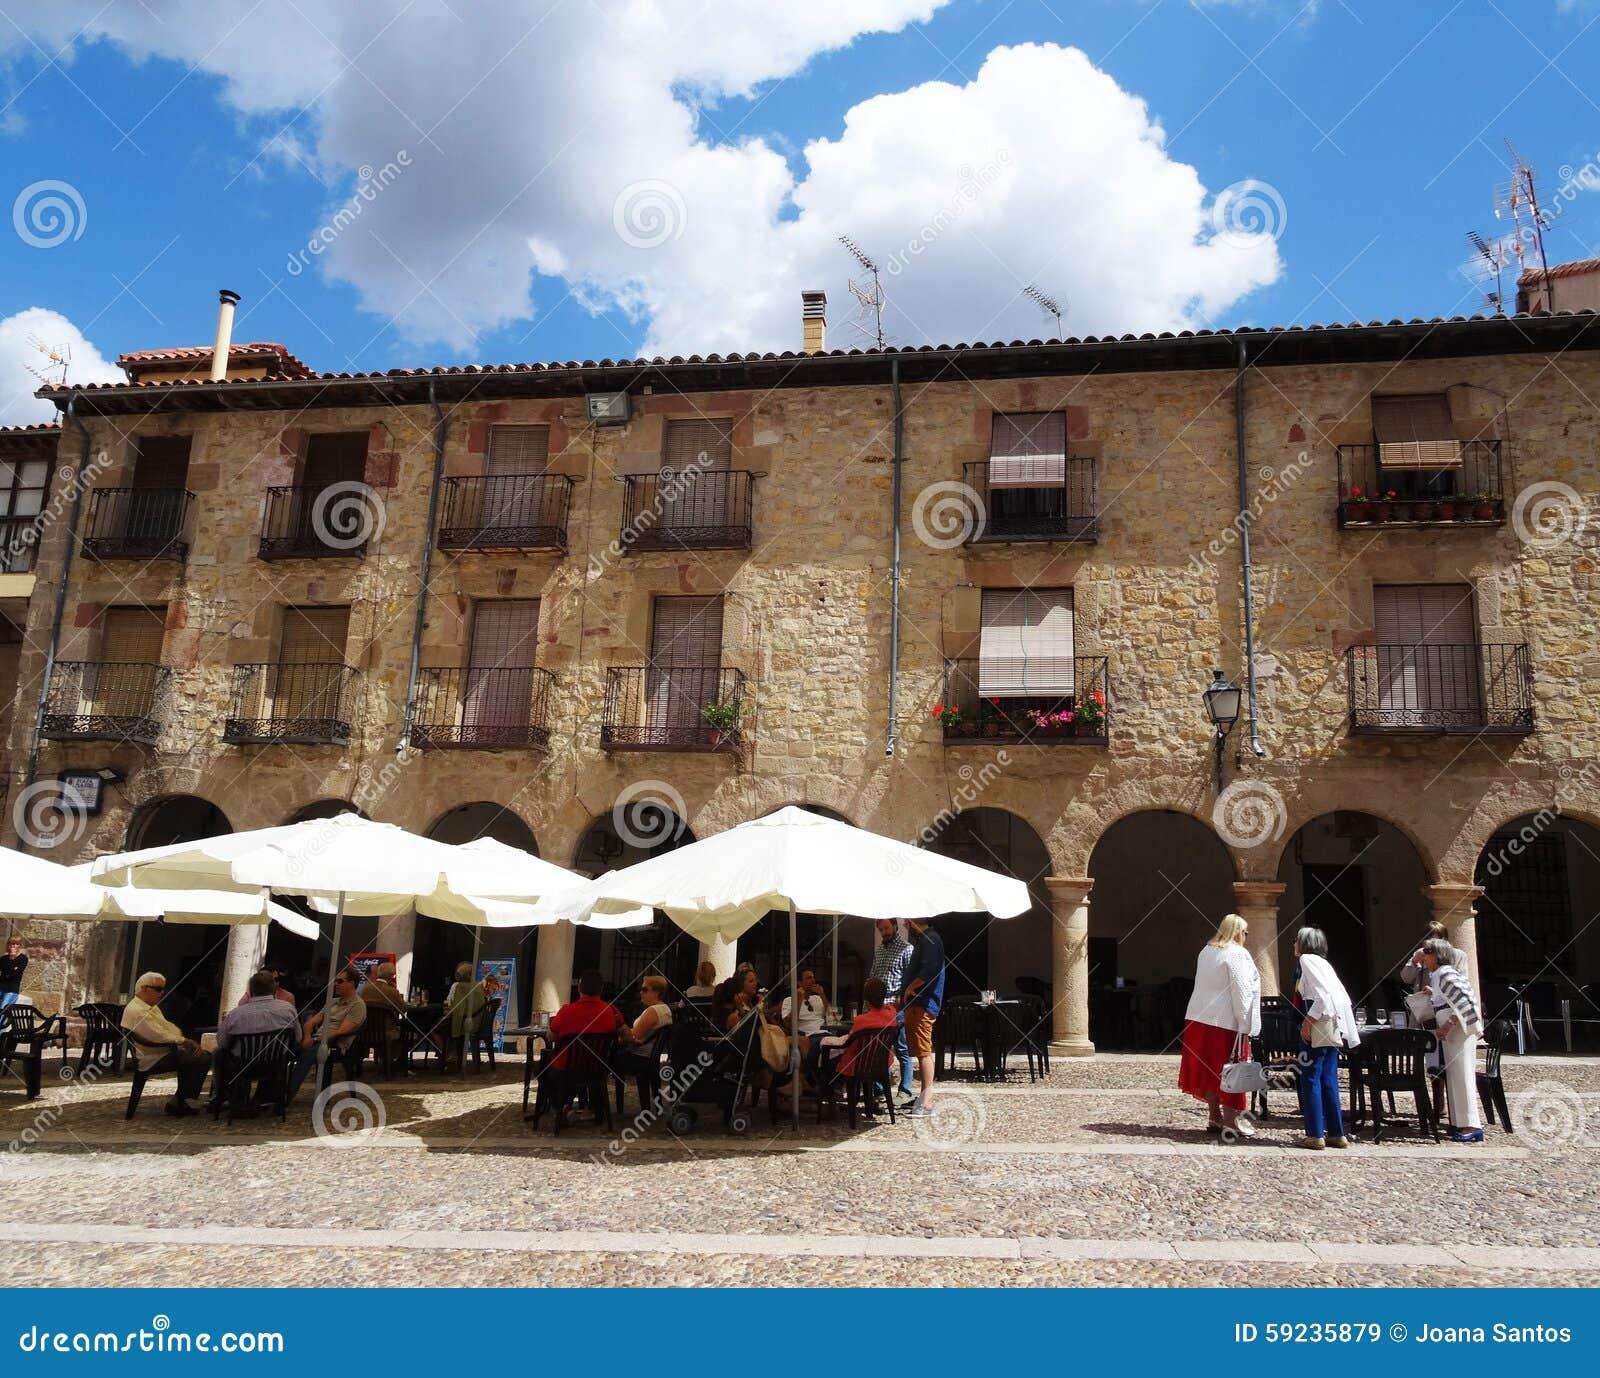 Download Siguenza, España imagen de archivo editorial. Imagen de pintoresco - 59235879